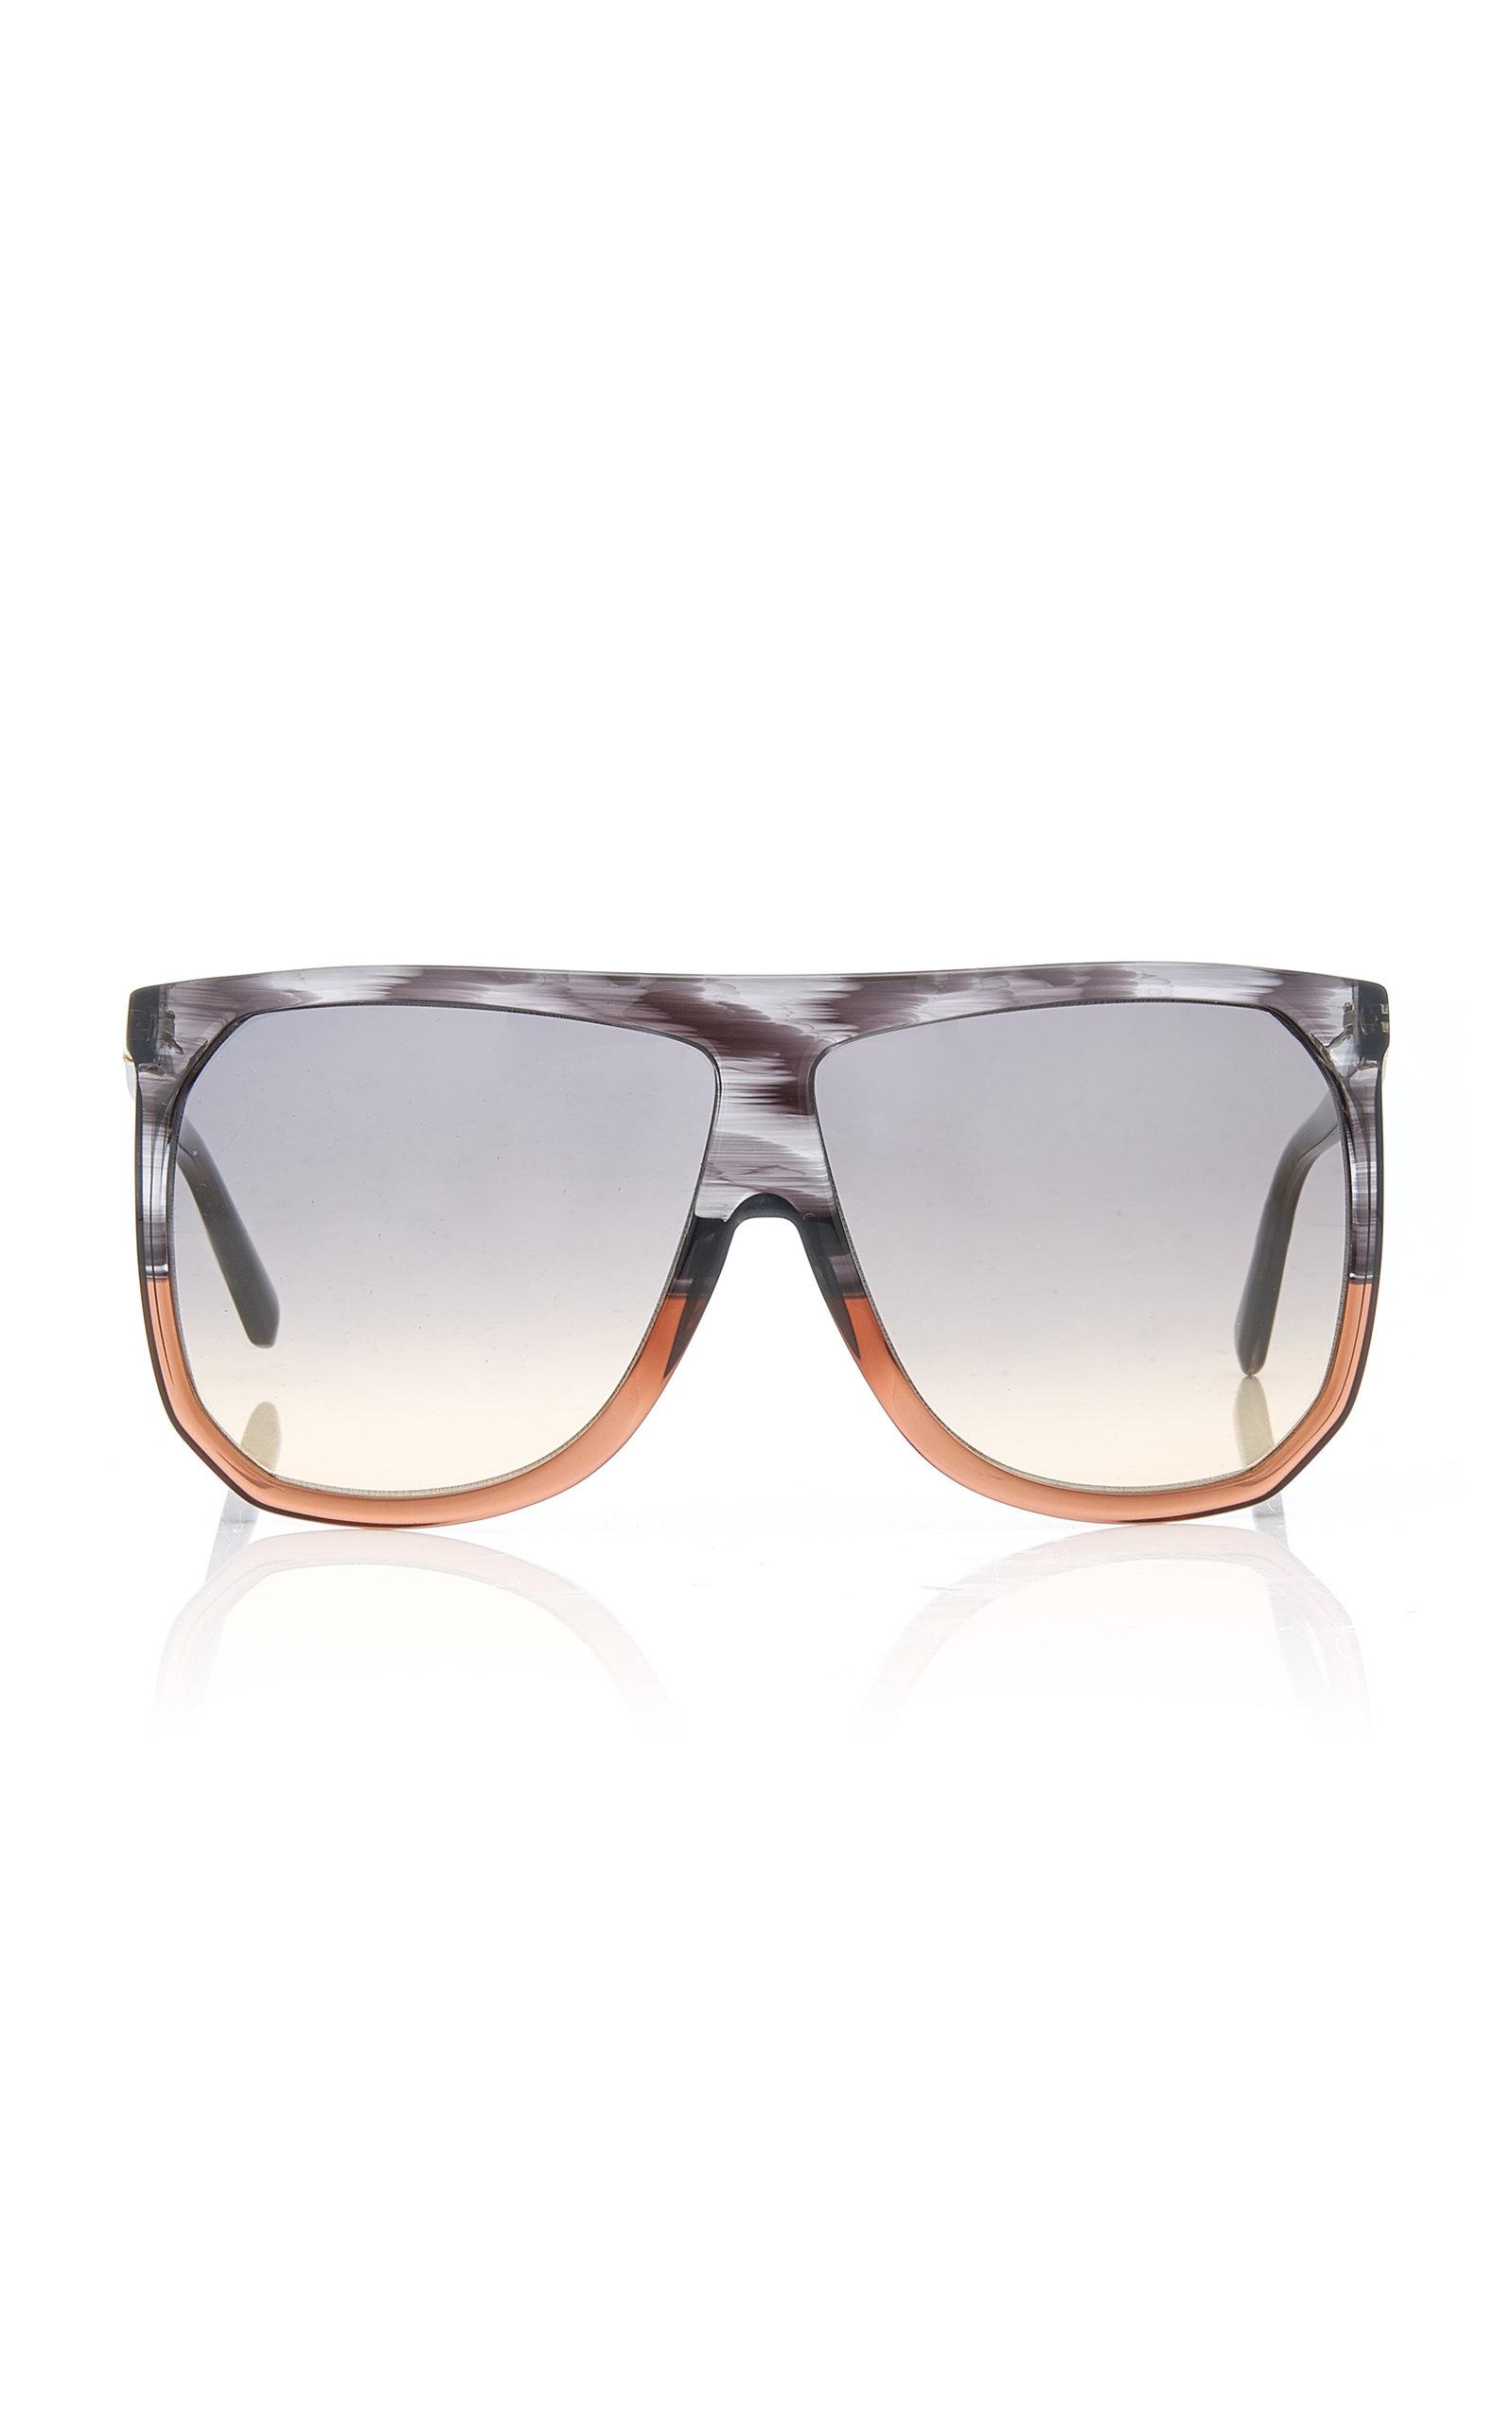 f0c4be3cb7f Loewe SunglassesFilipa Two-Tone Acetate Sunglasses. CLOSE. Loading